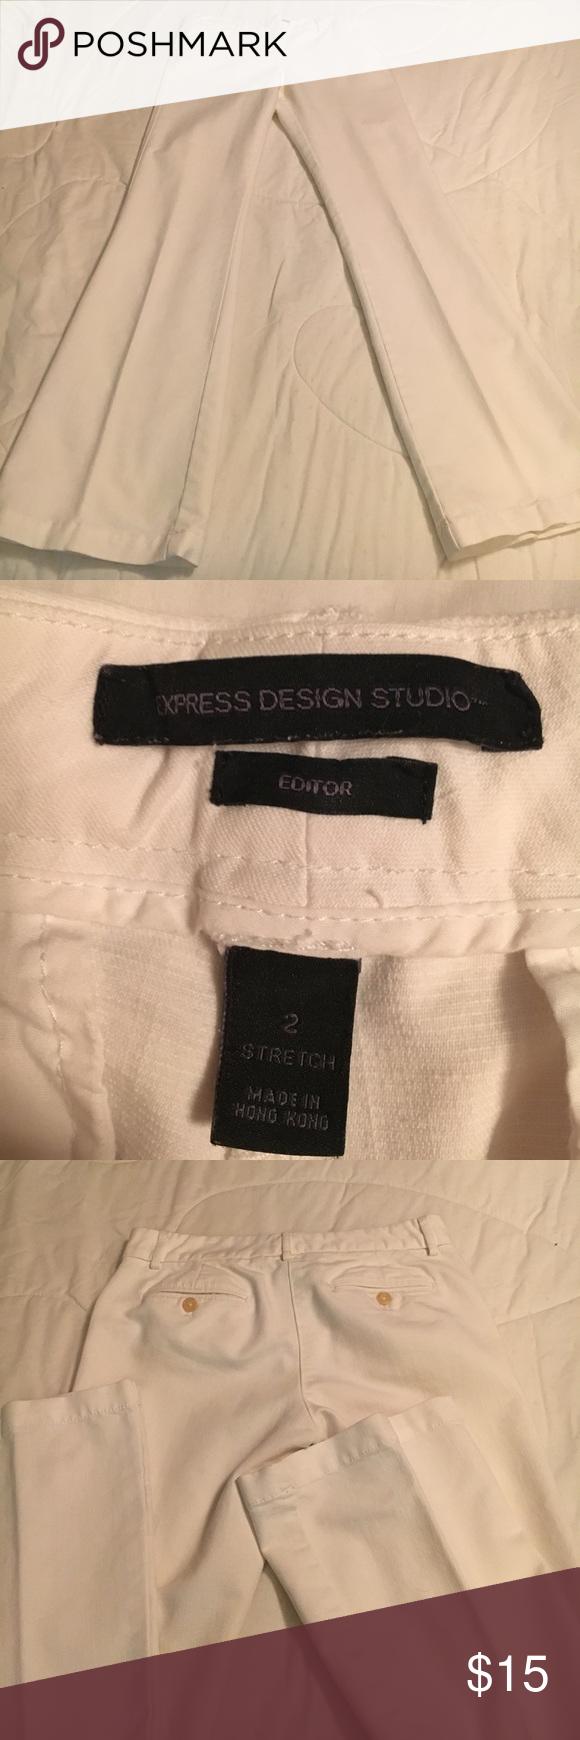 "Express Design Studio Pants Approx 31"" Inseam, inside Button missing but Pants fasten fine Express Pants"